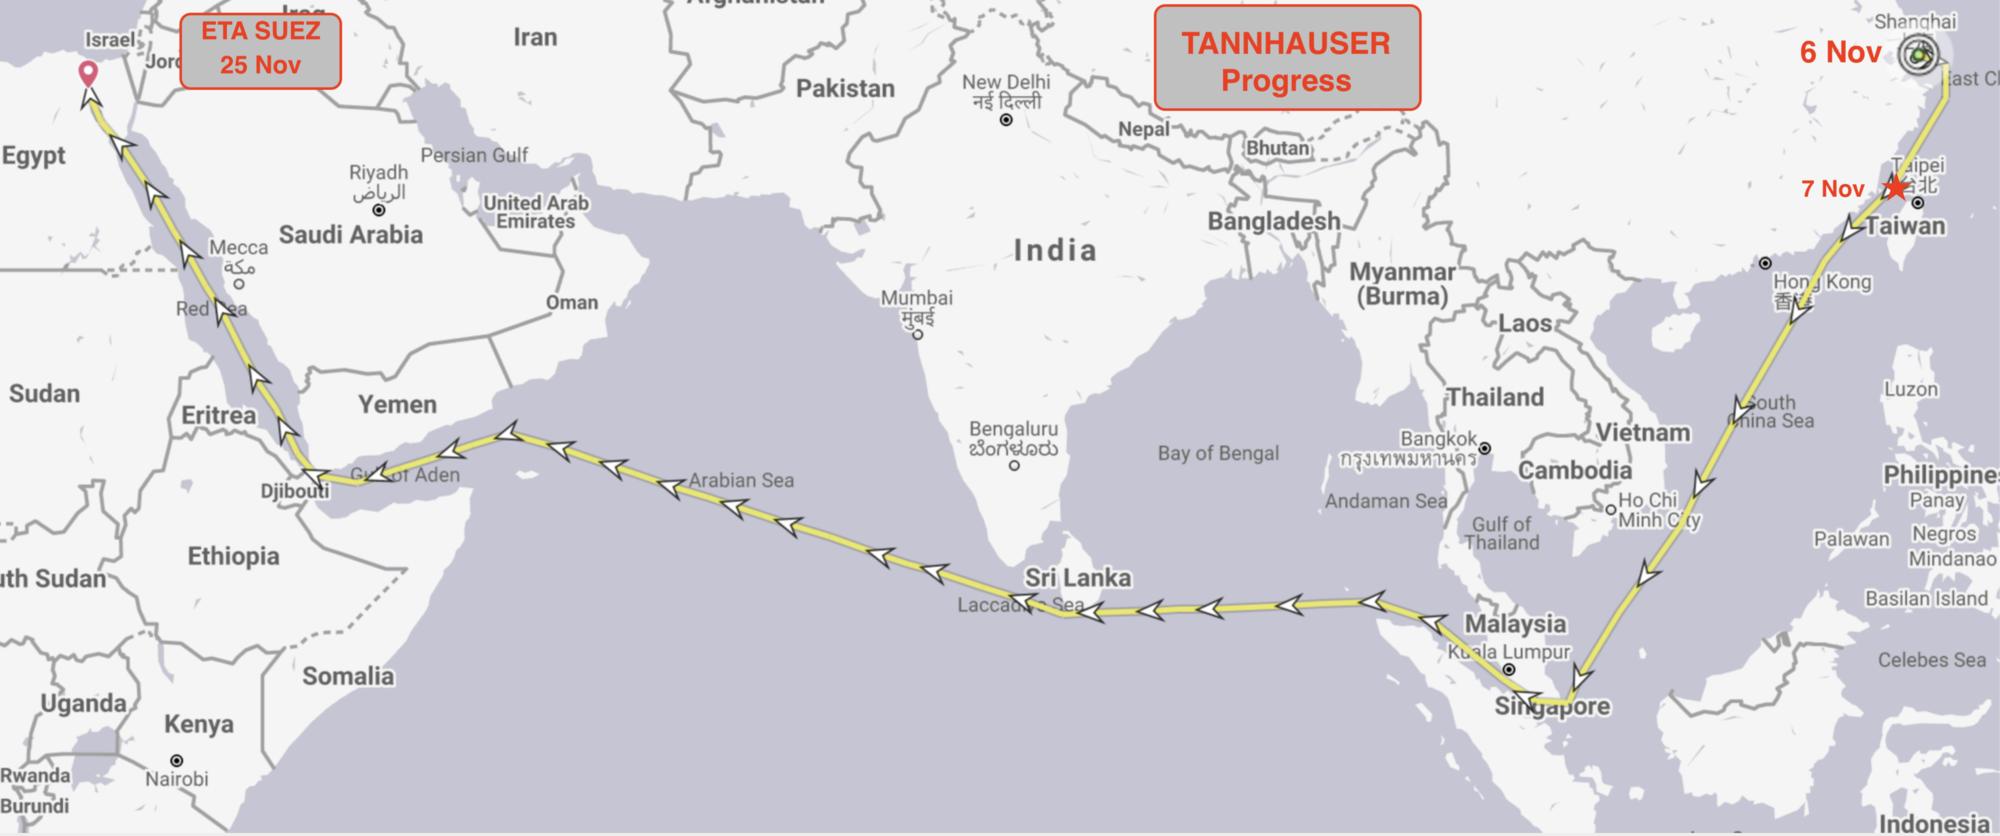 Tannhauser to Suez.png